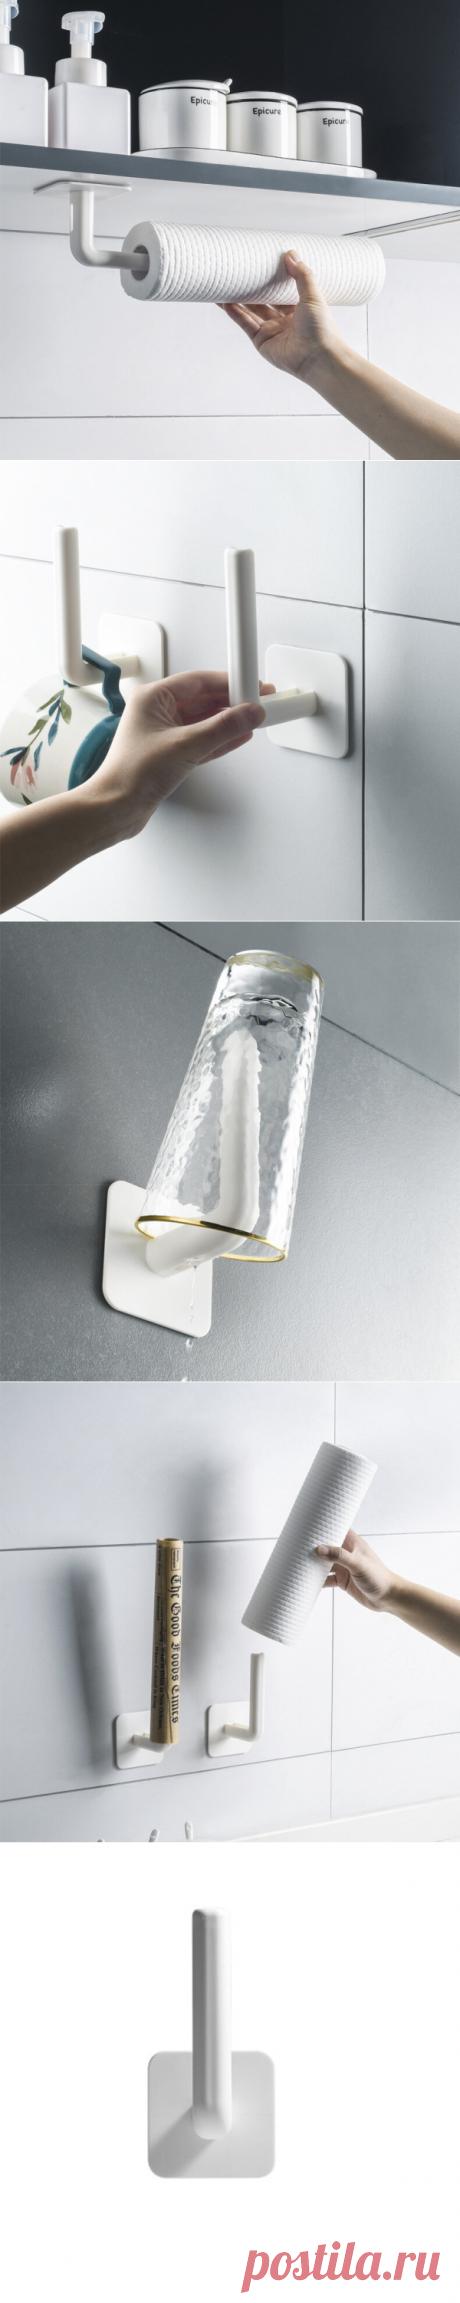 roll paper holder tissue towel storage organizer toilet kitchen bathroom hanging rack at Banggood